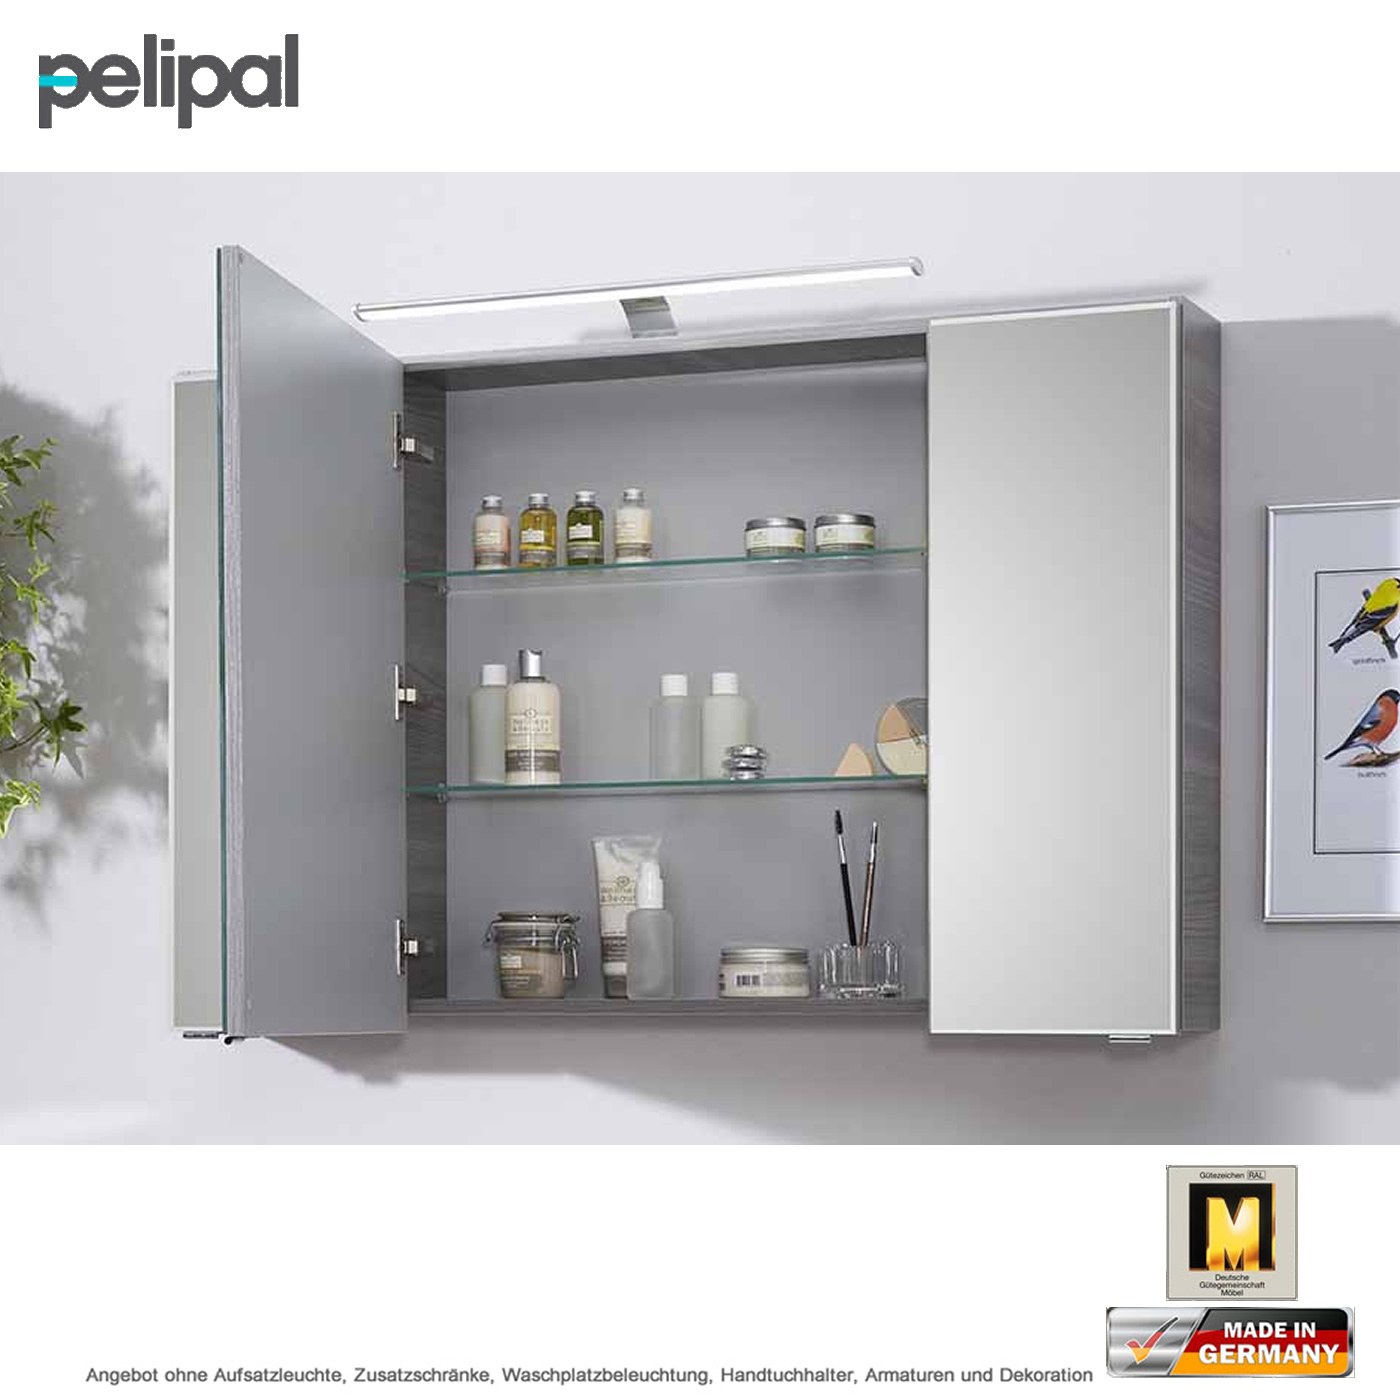 pelipal solitaire 6110 spiegelschrank 110 cm impulsbad. Black Bedroom Furniture Sets. Home Design Ideas